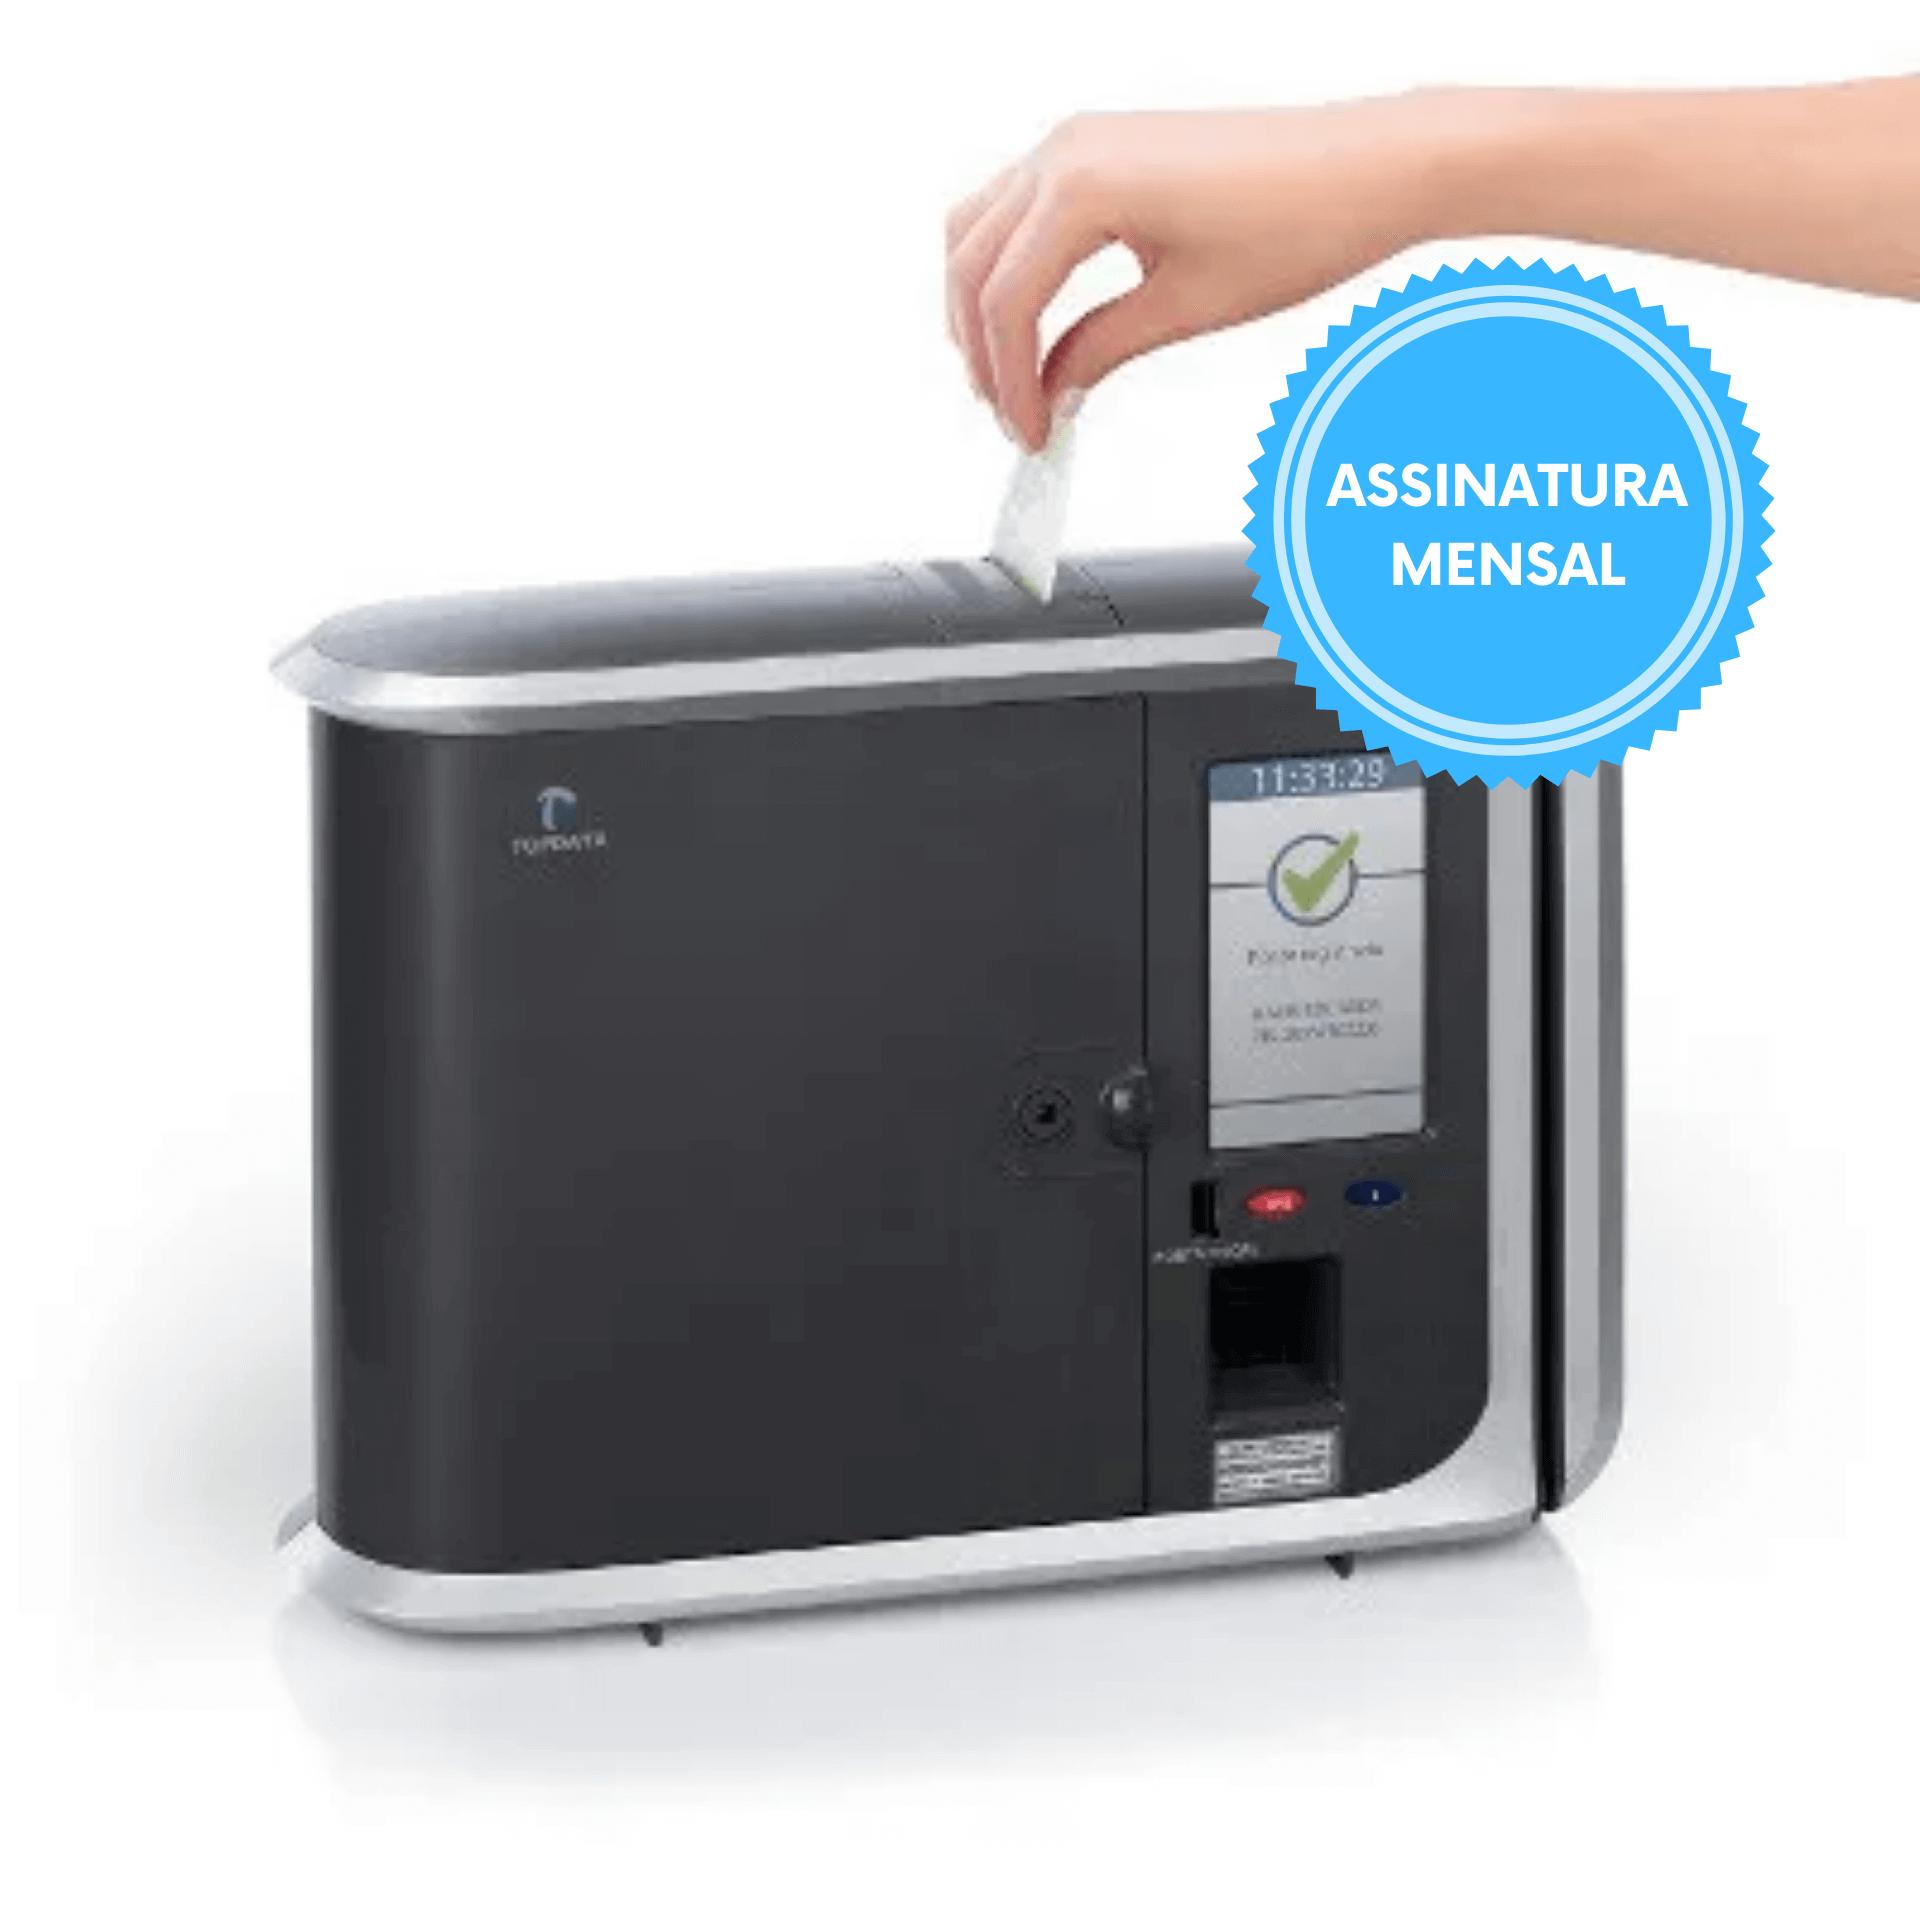 Relógio Ponto Inner REP PLUS Biométrico Proximidade Software